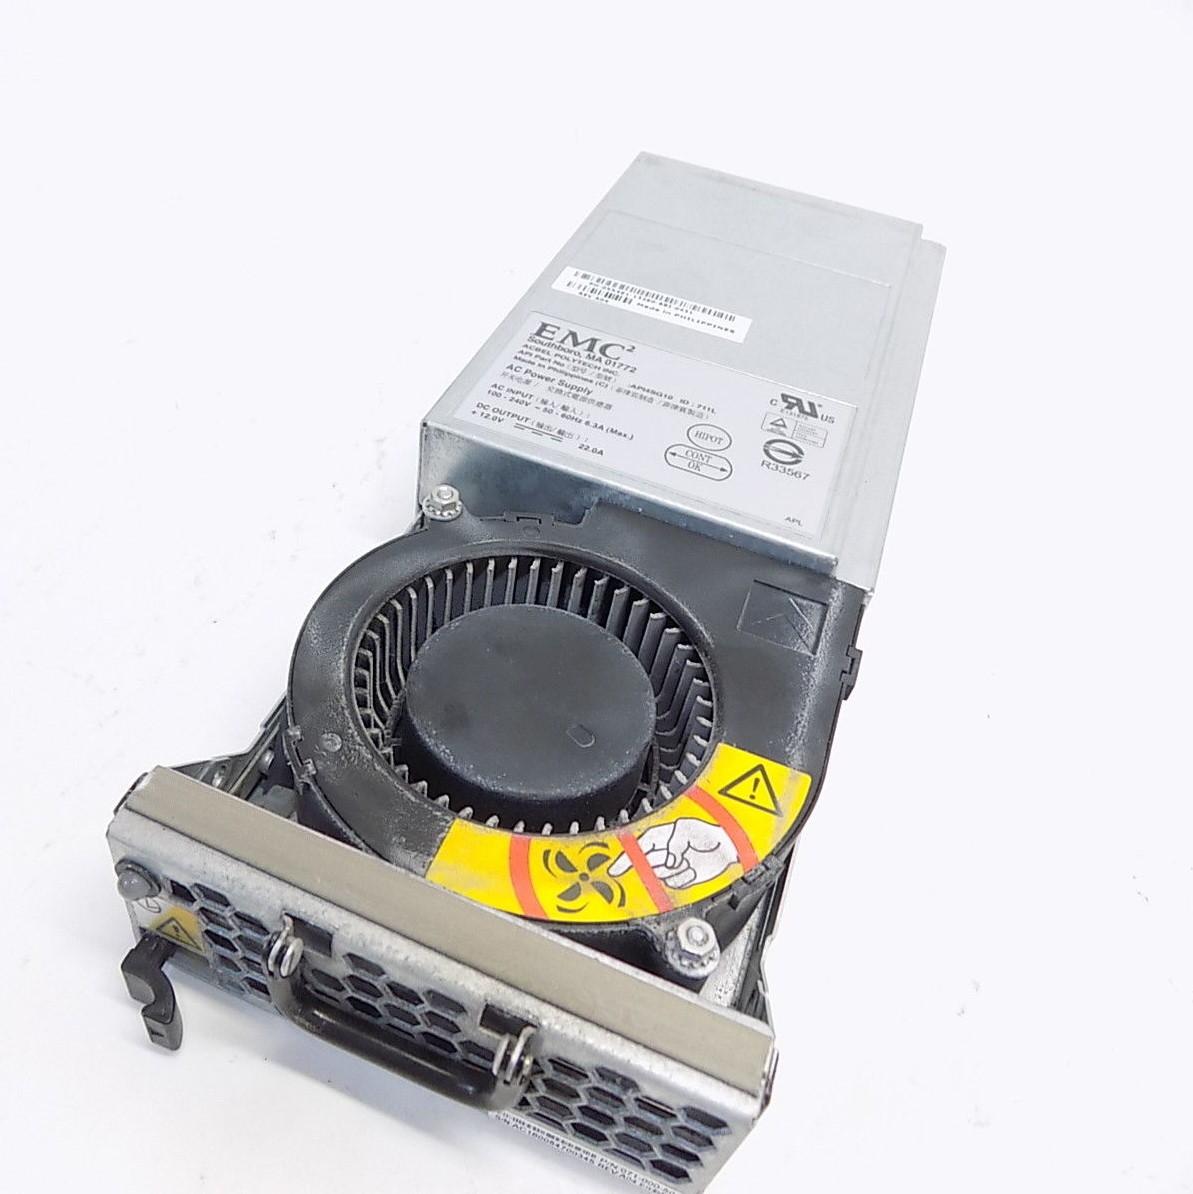 EMC 071-000-462 SPE-N JPE-i Power Supply and Blower